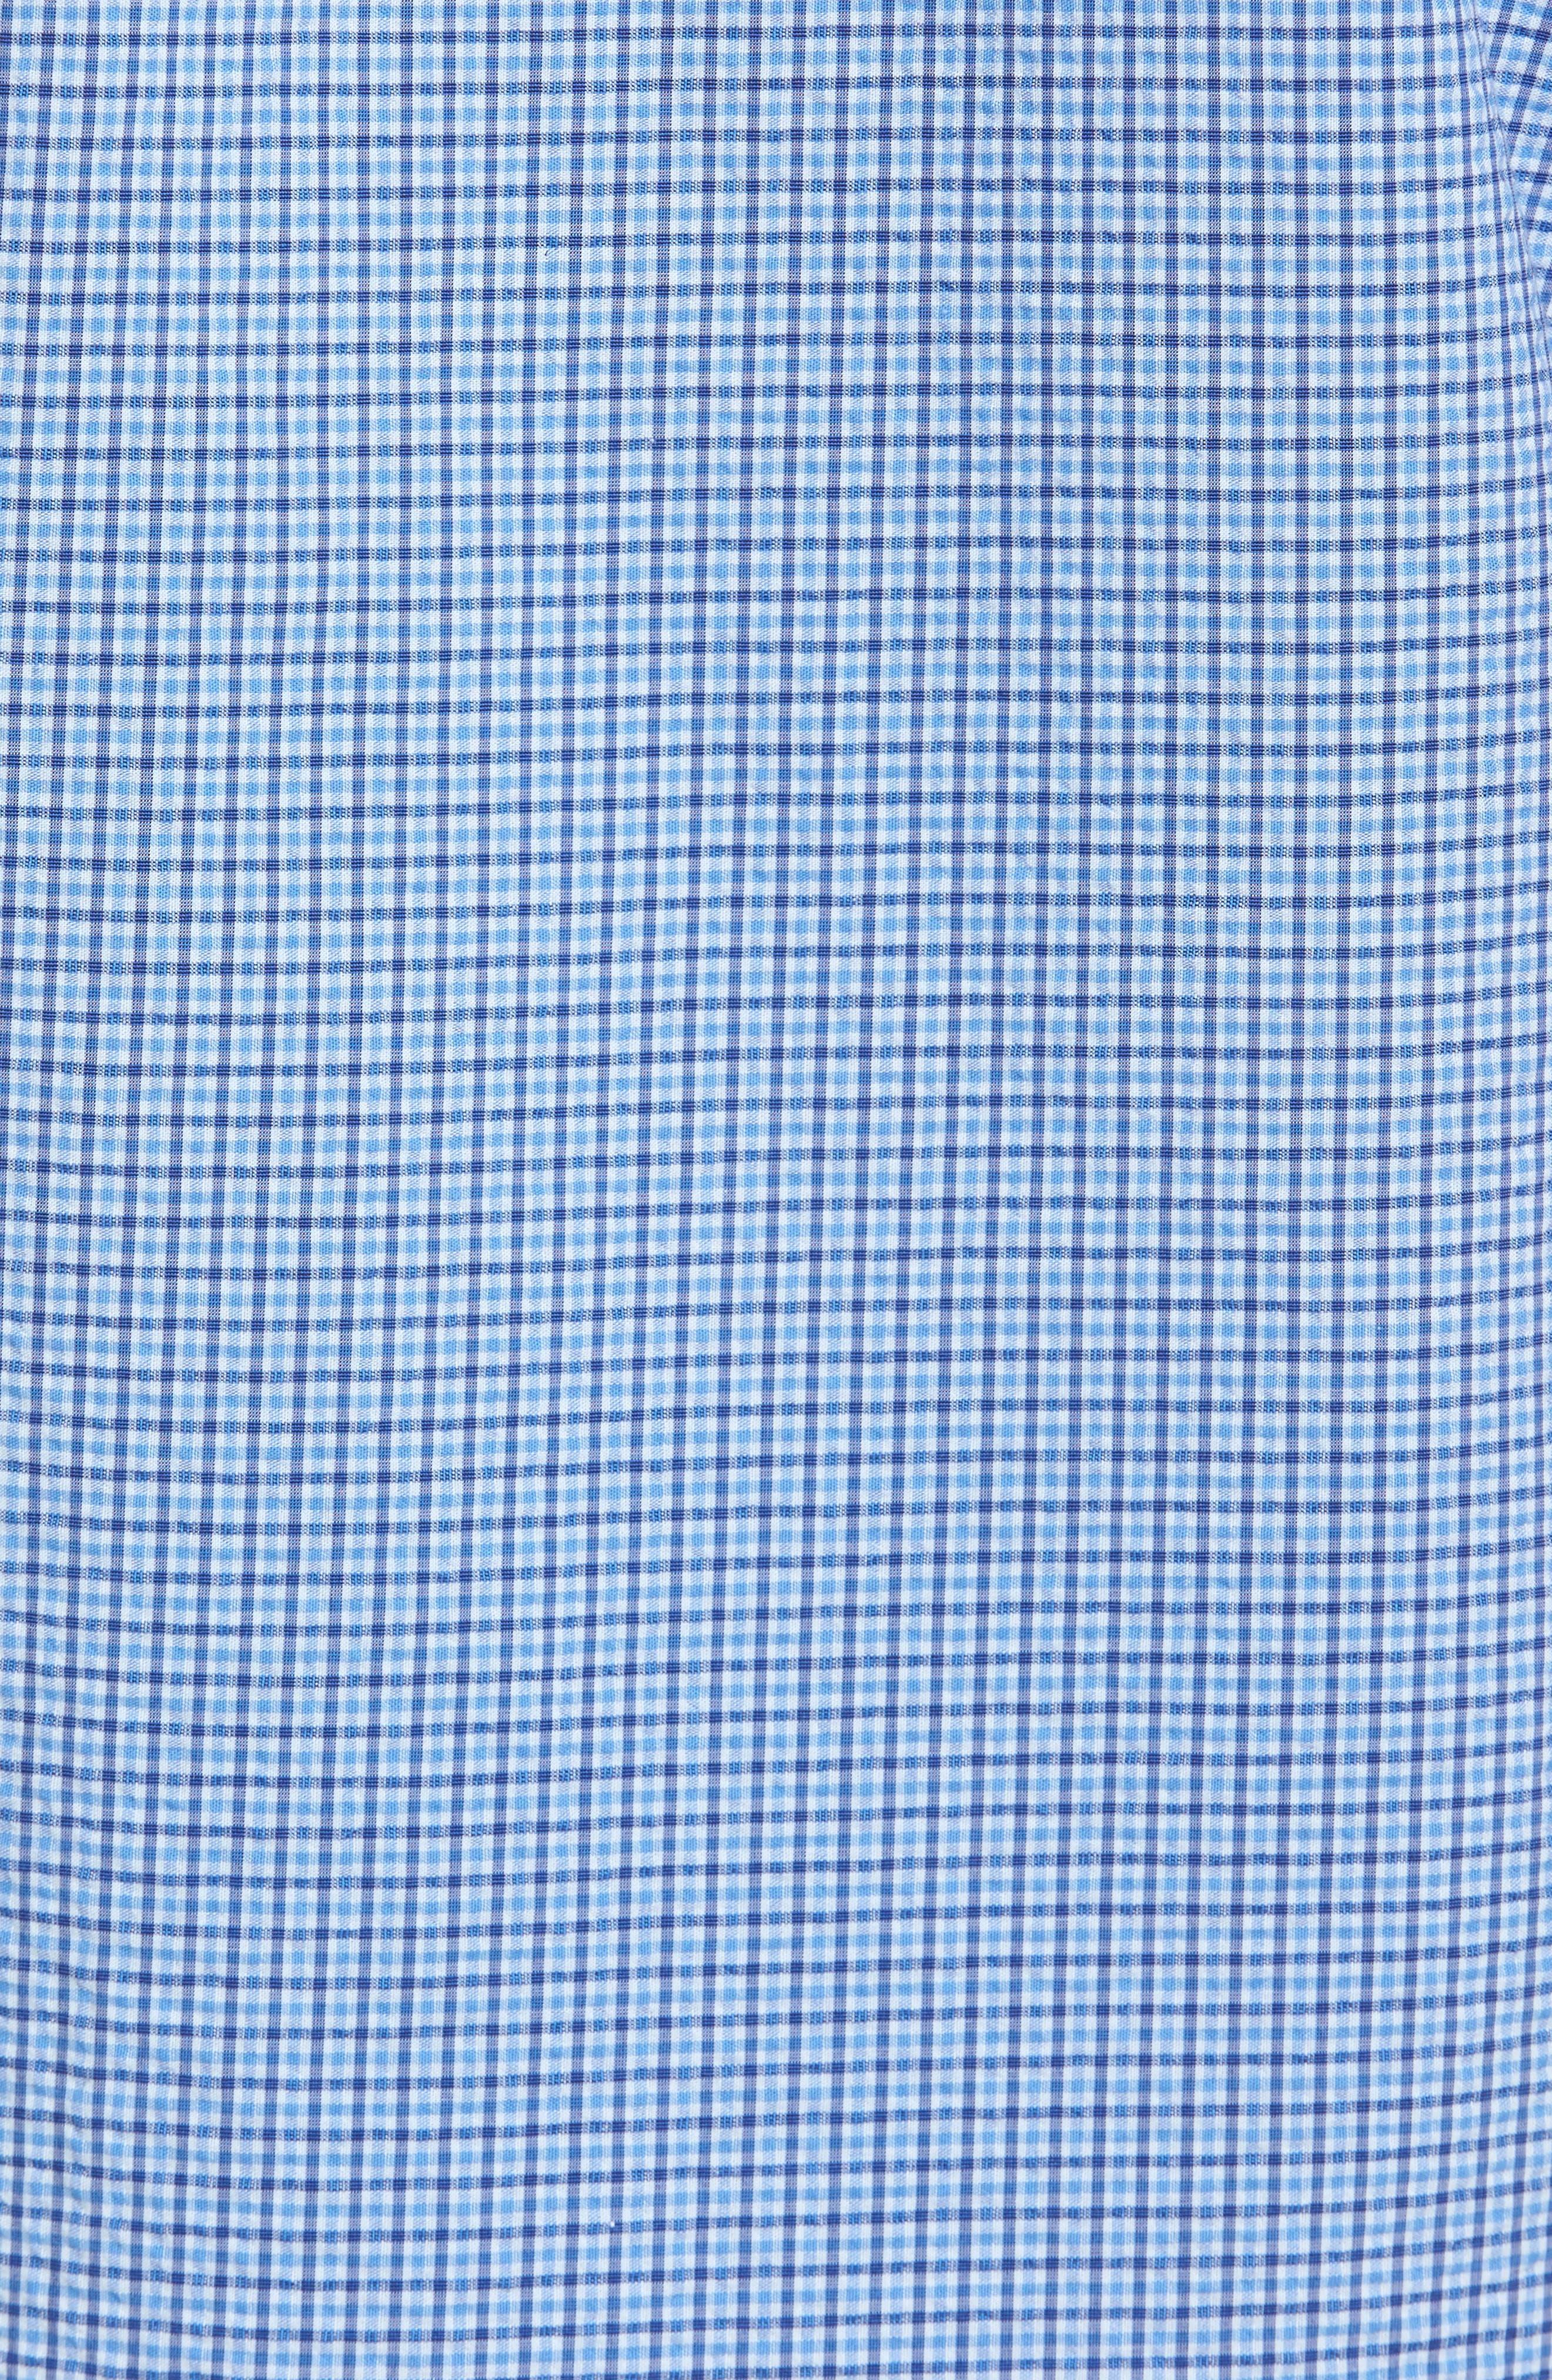 Short Sleeve Sport Shirt,                             Alternate thumbnail 5, color,                             Teal